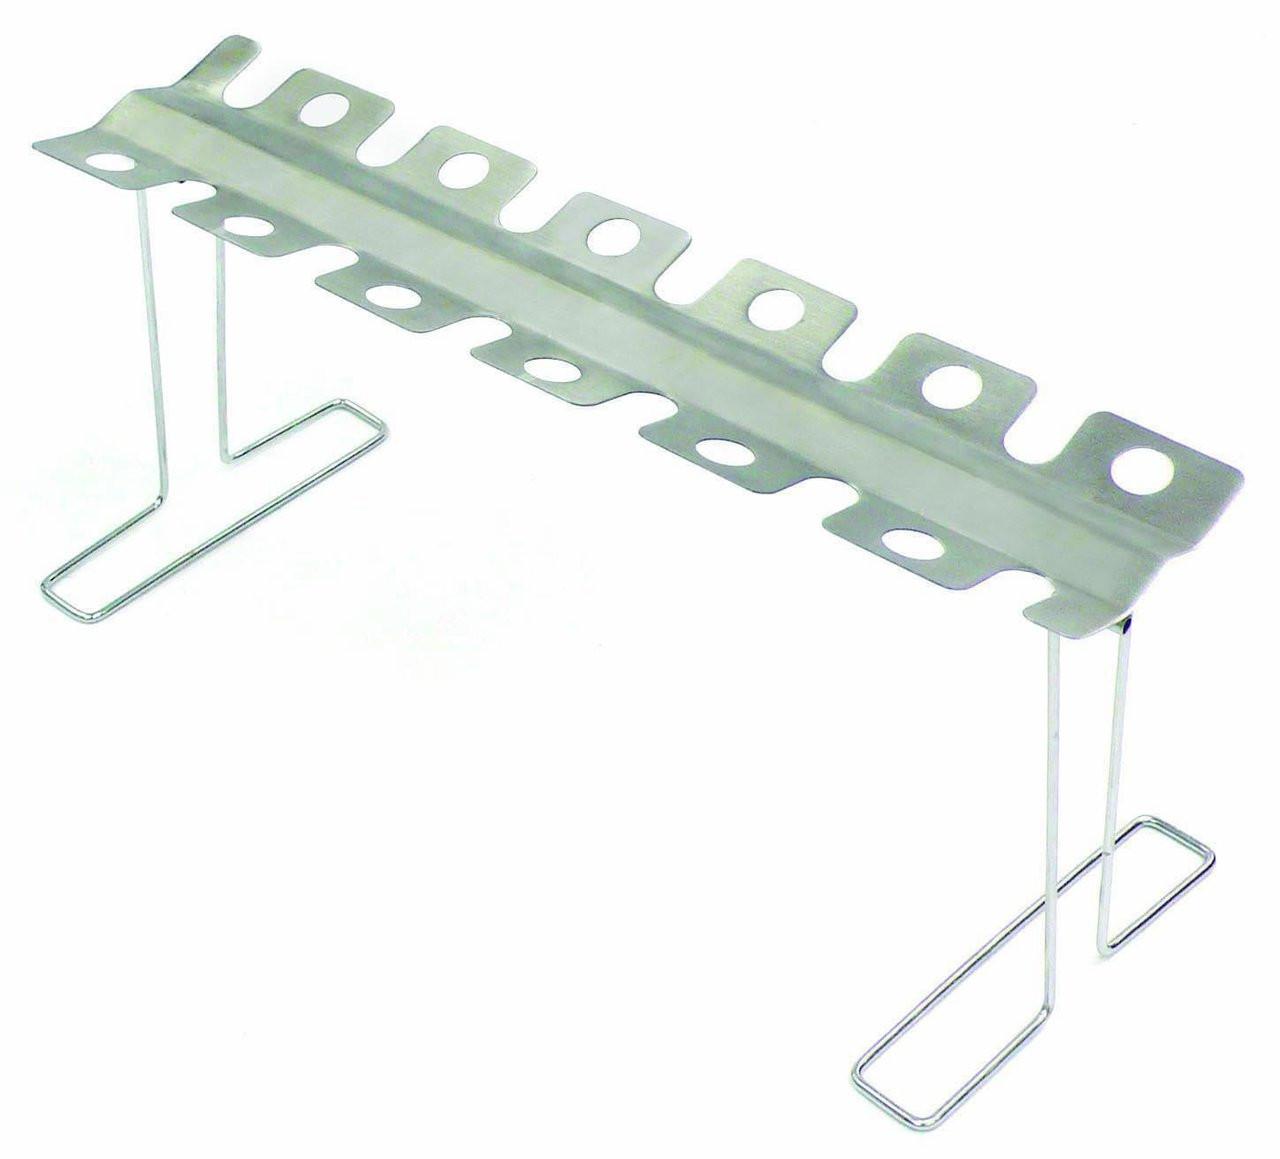 Mr Bar B Q 06026X 10-Inch Round Non-Stick Topper